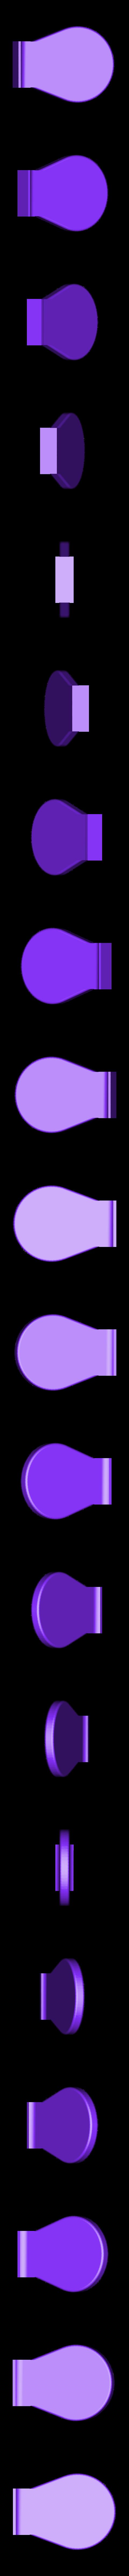 Mini_Scratcher_001.STL Download free STL file Lottery Scratcher Tool • 3D print model, Tarnliare